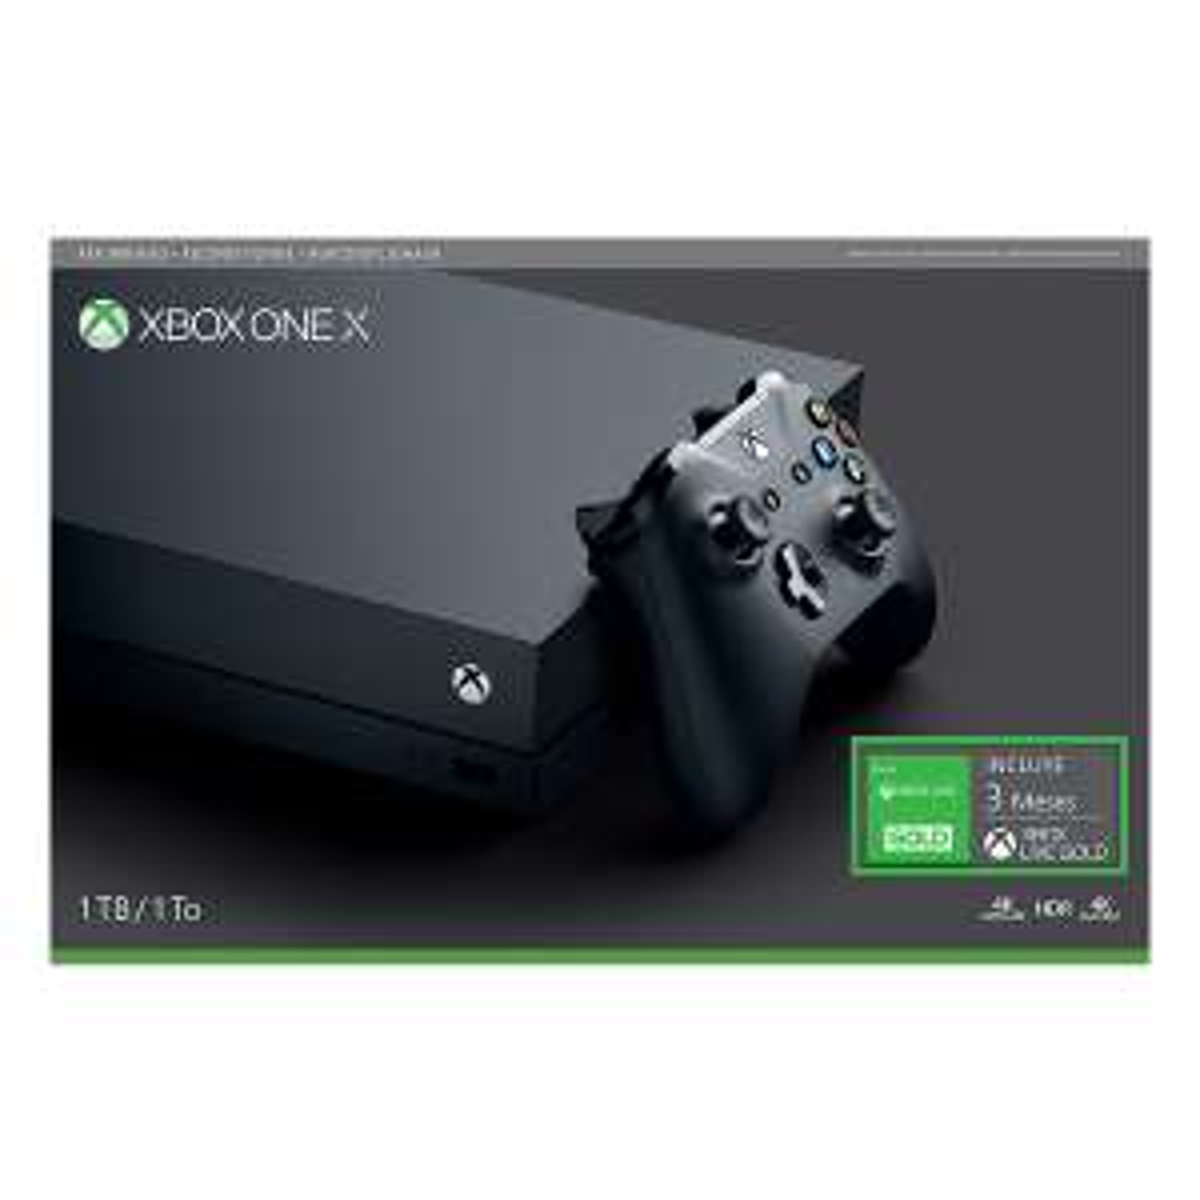 Chedraui en línea: Xbox one x 1tb + 3 meses Xbox live gold refubished